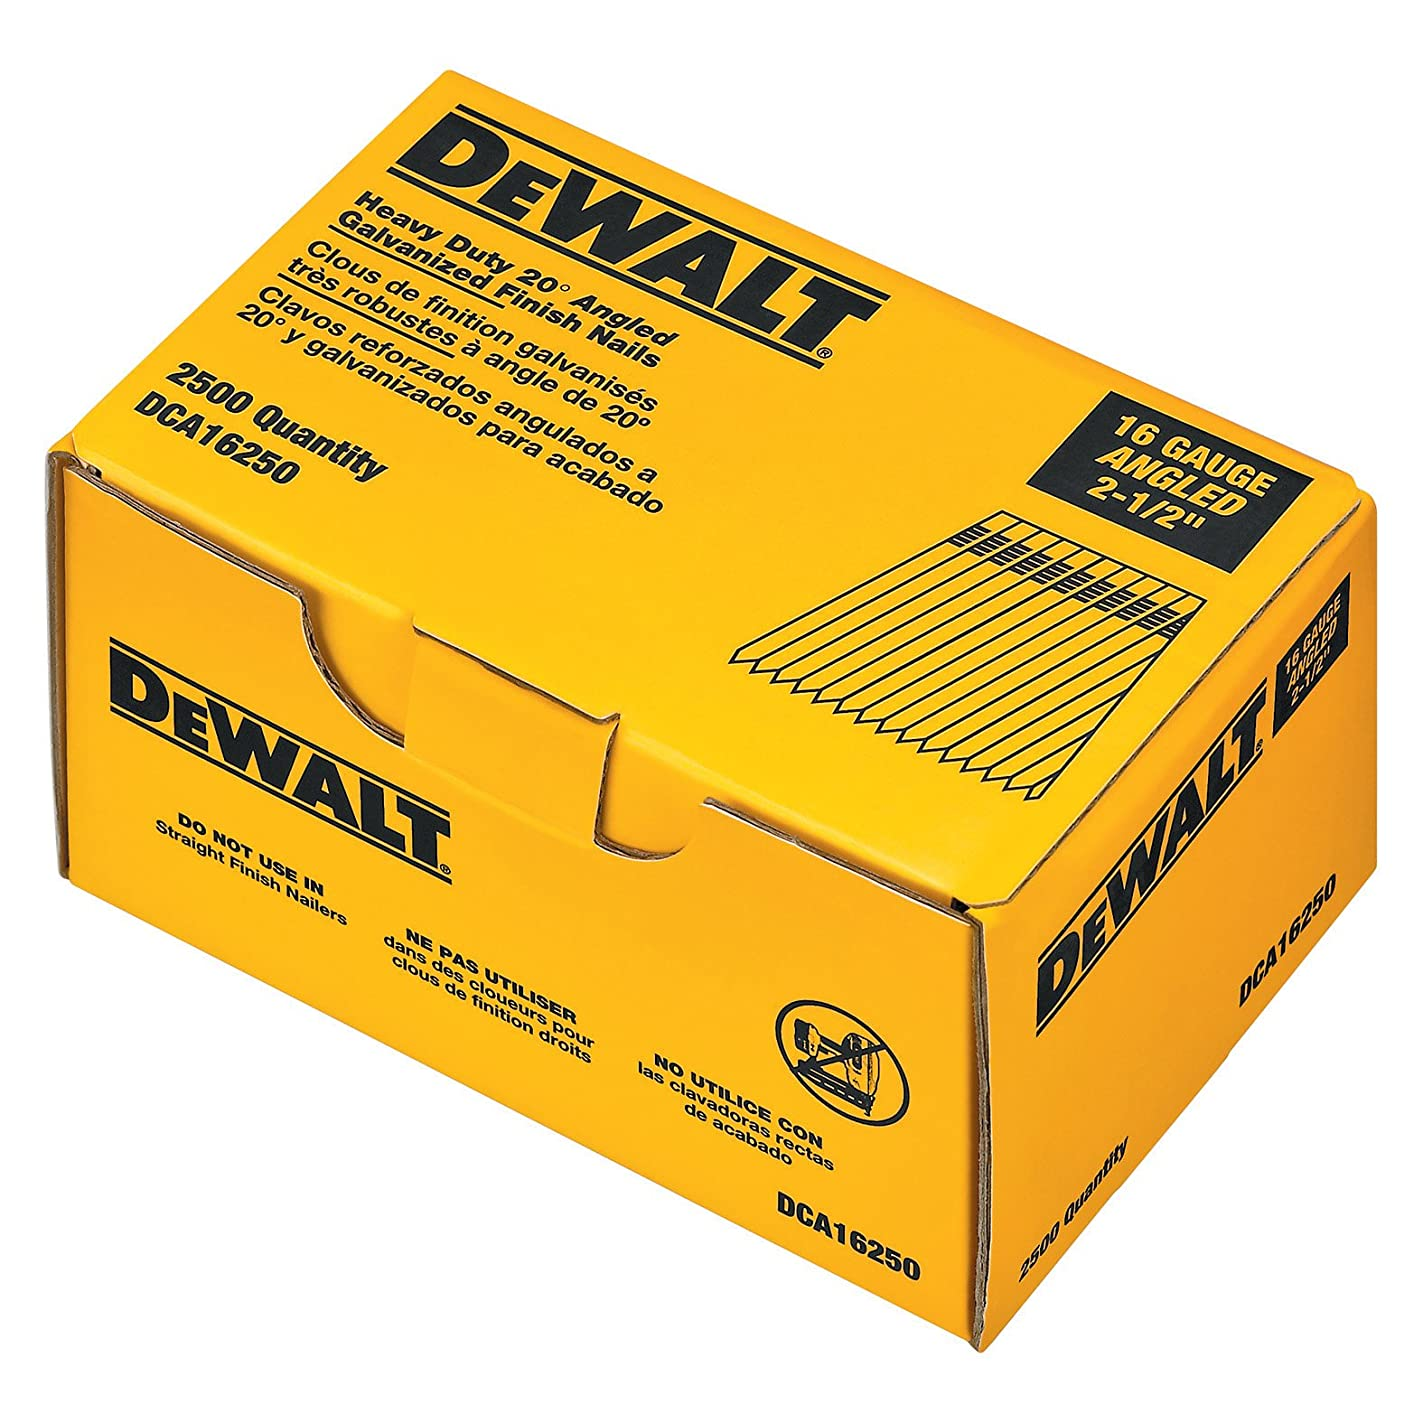 DEWALT DCA16250 2-1/2-Inch by 16 Gauge 20-Degree Finish Nail (2,500 per Box)